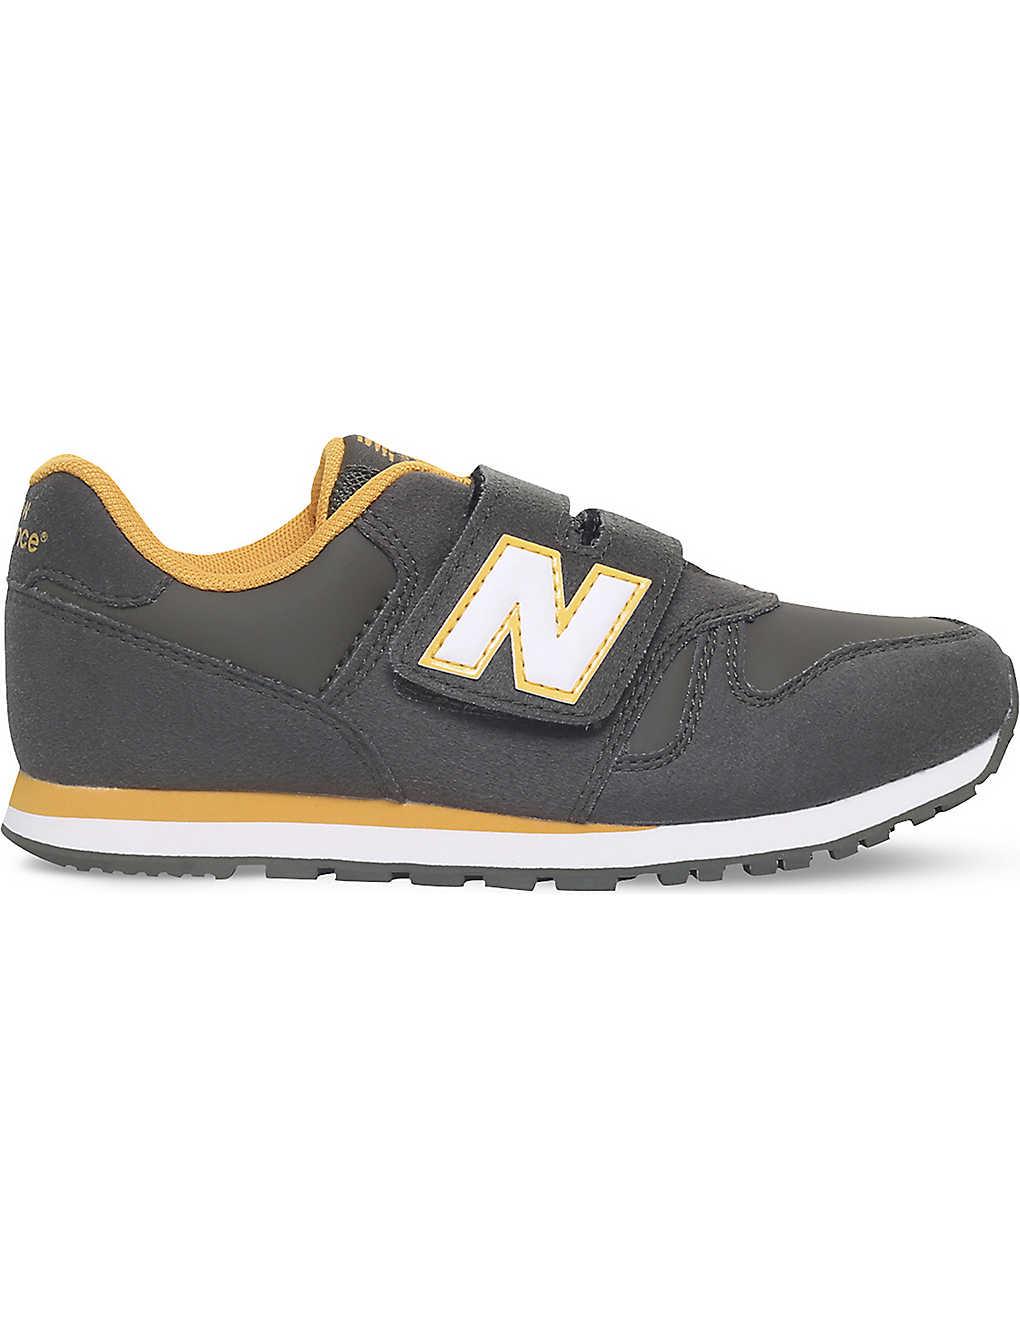 a933b04820384 NEW BALANCE - 373 suede trainers 6 - 11.5 years | Selfridges.com